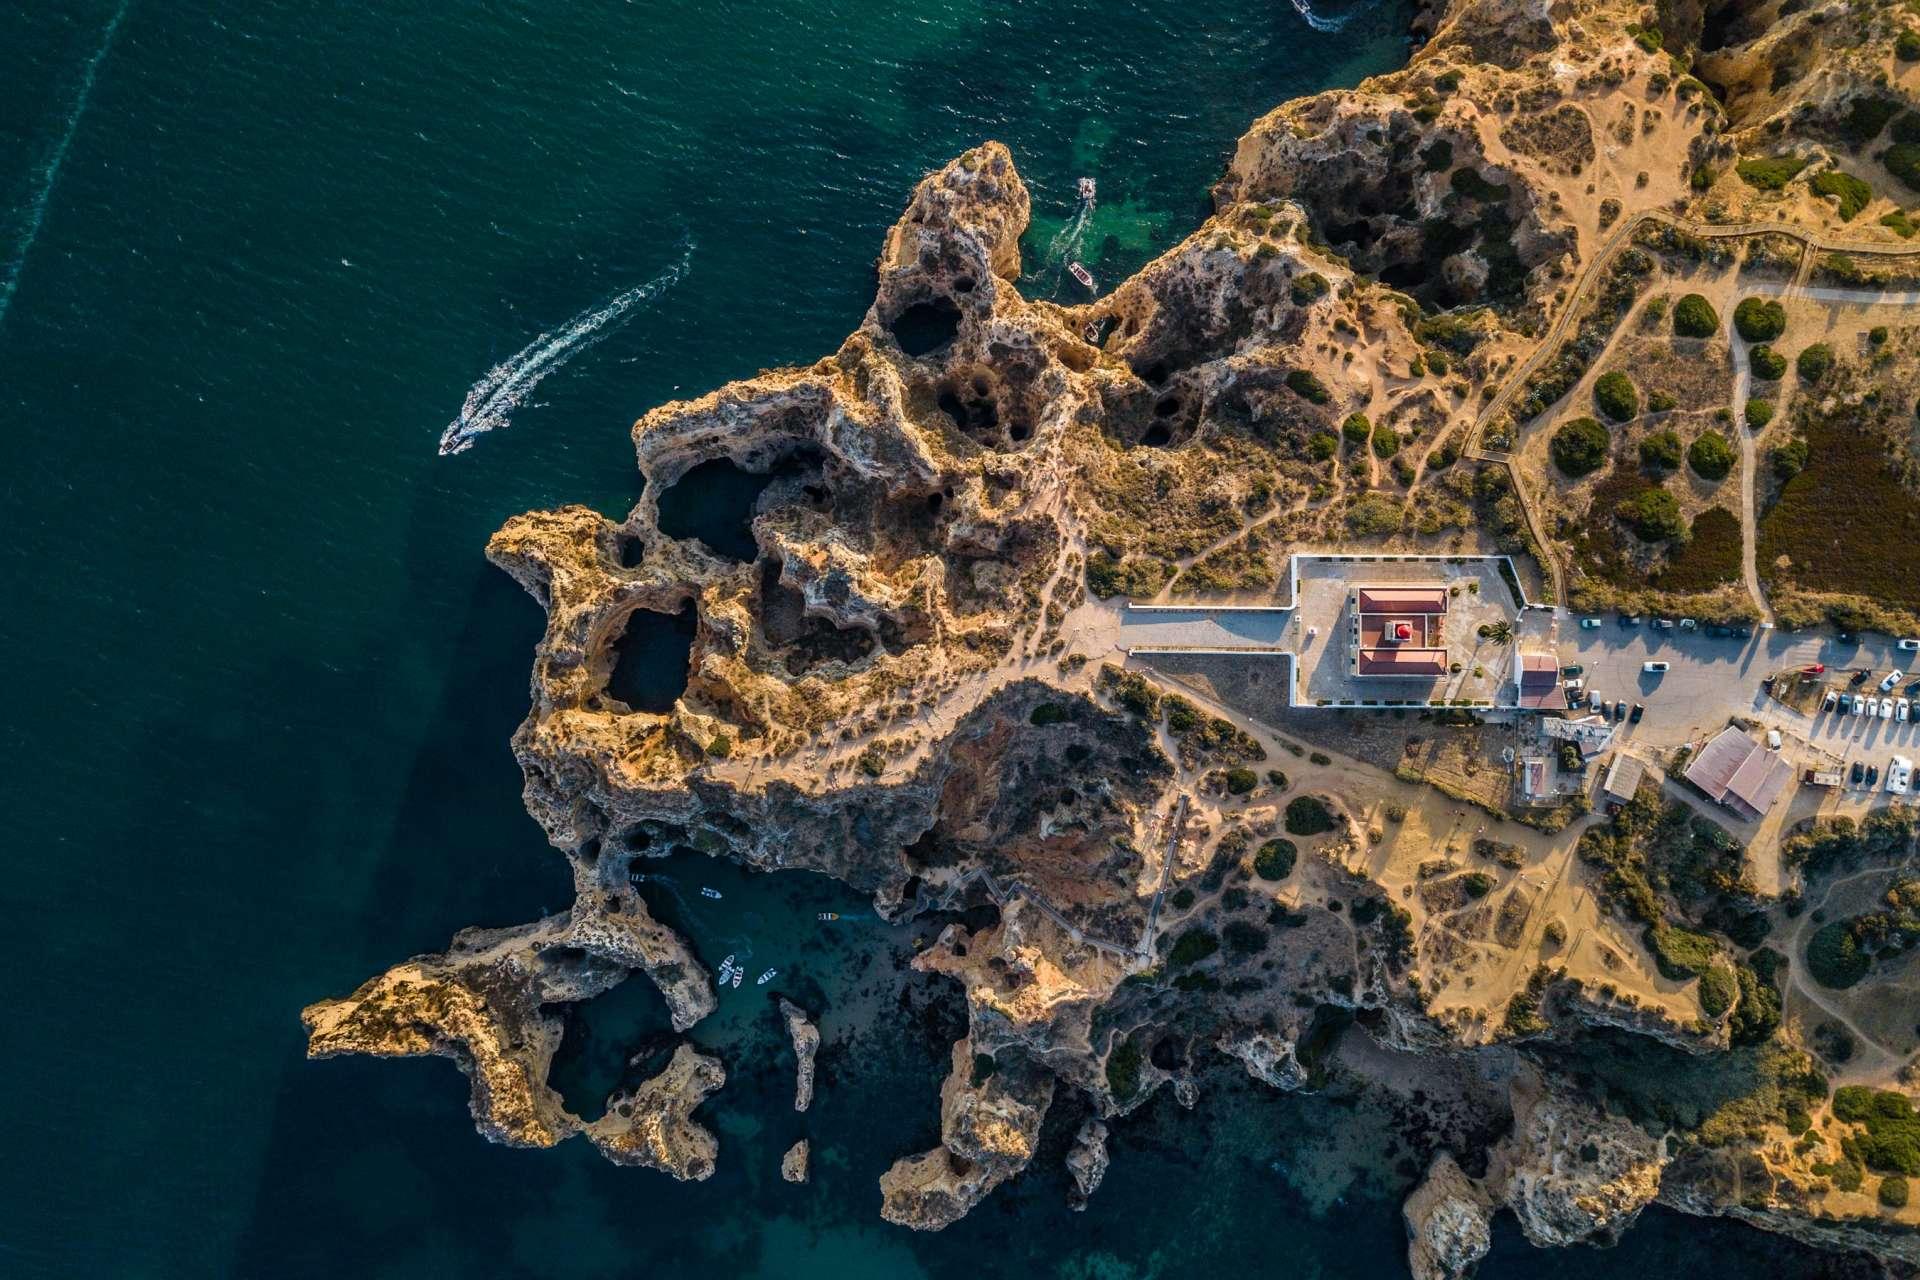 Algarve From Above Drone Photography Enrico Pescantini Farolda Ponta da Piedade 2